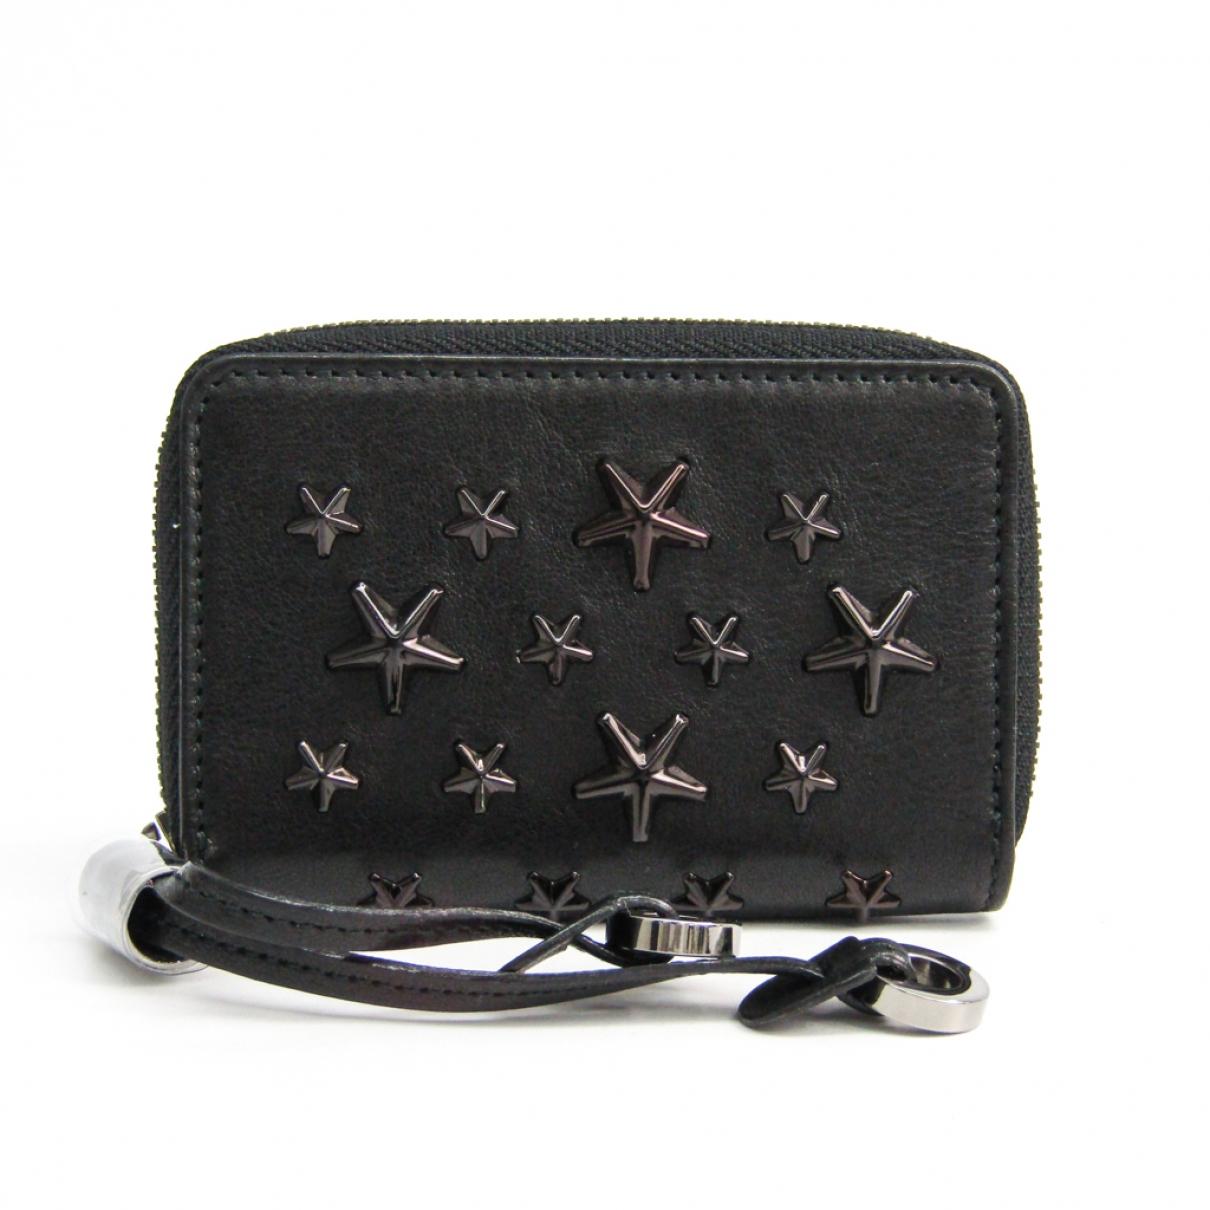 Jimmy Choo \N Black Leather wallet for Women \N